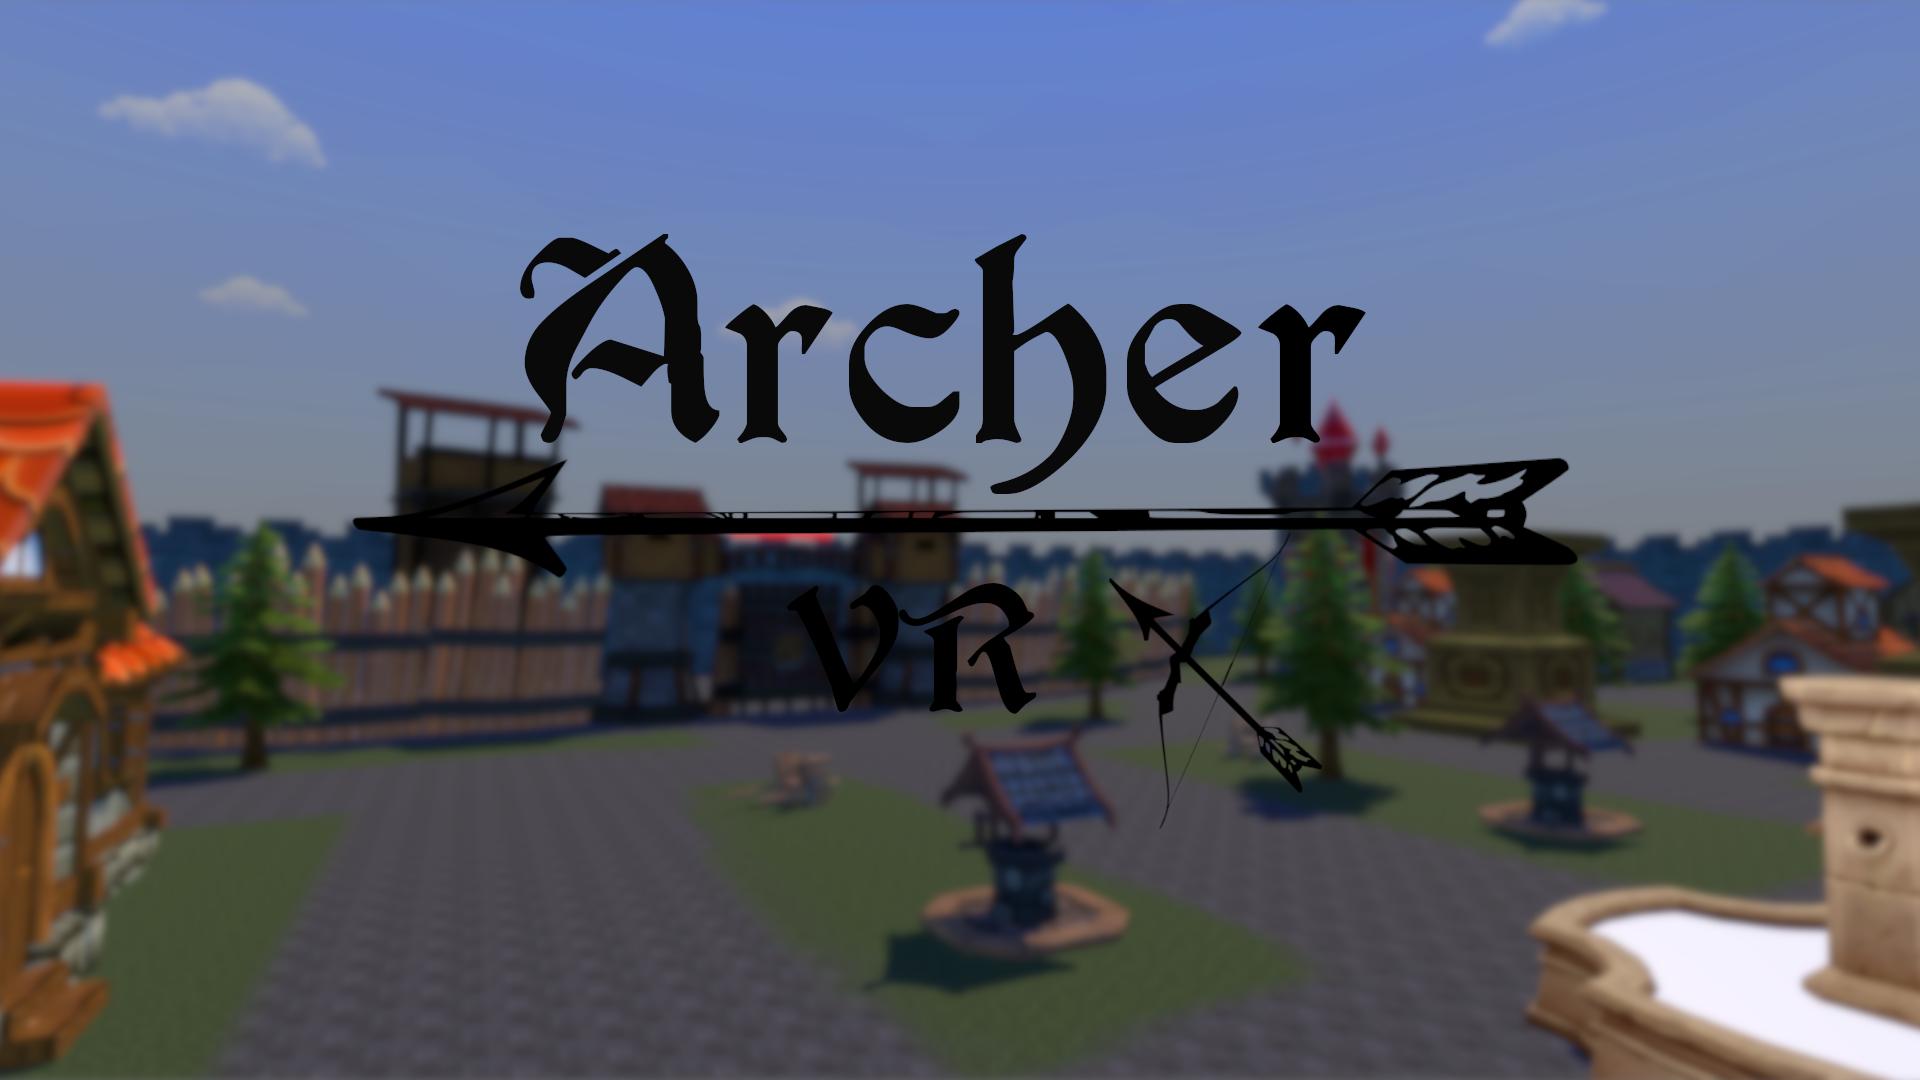 ArcherVR